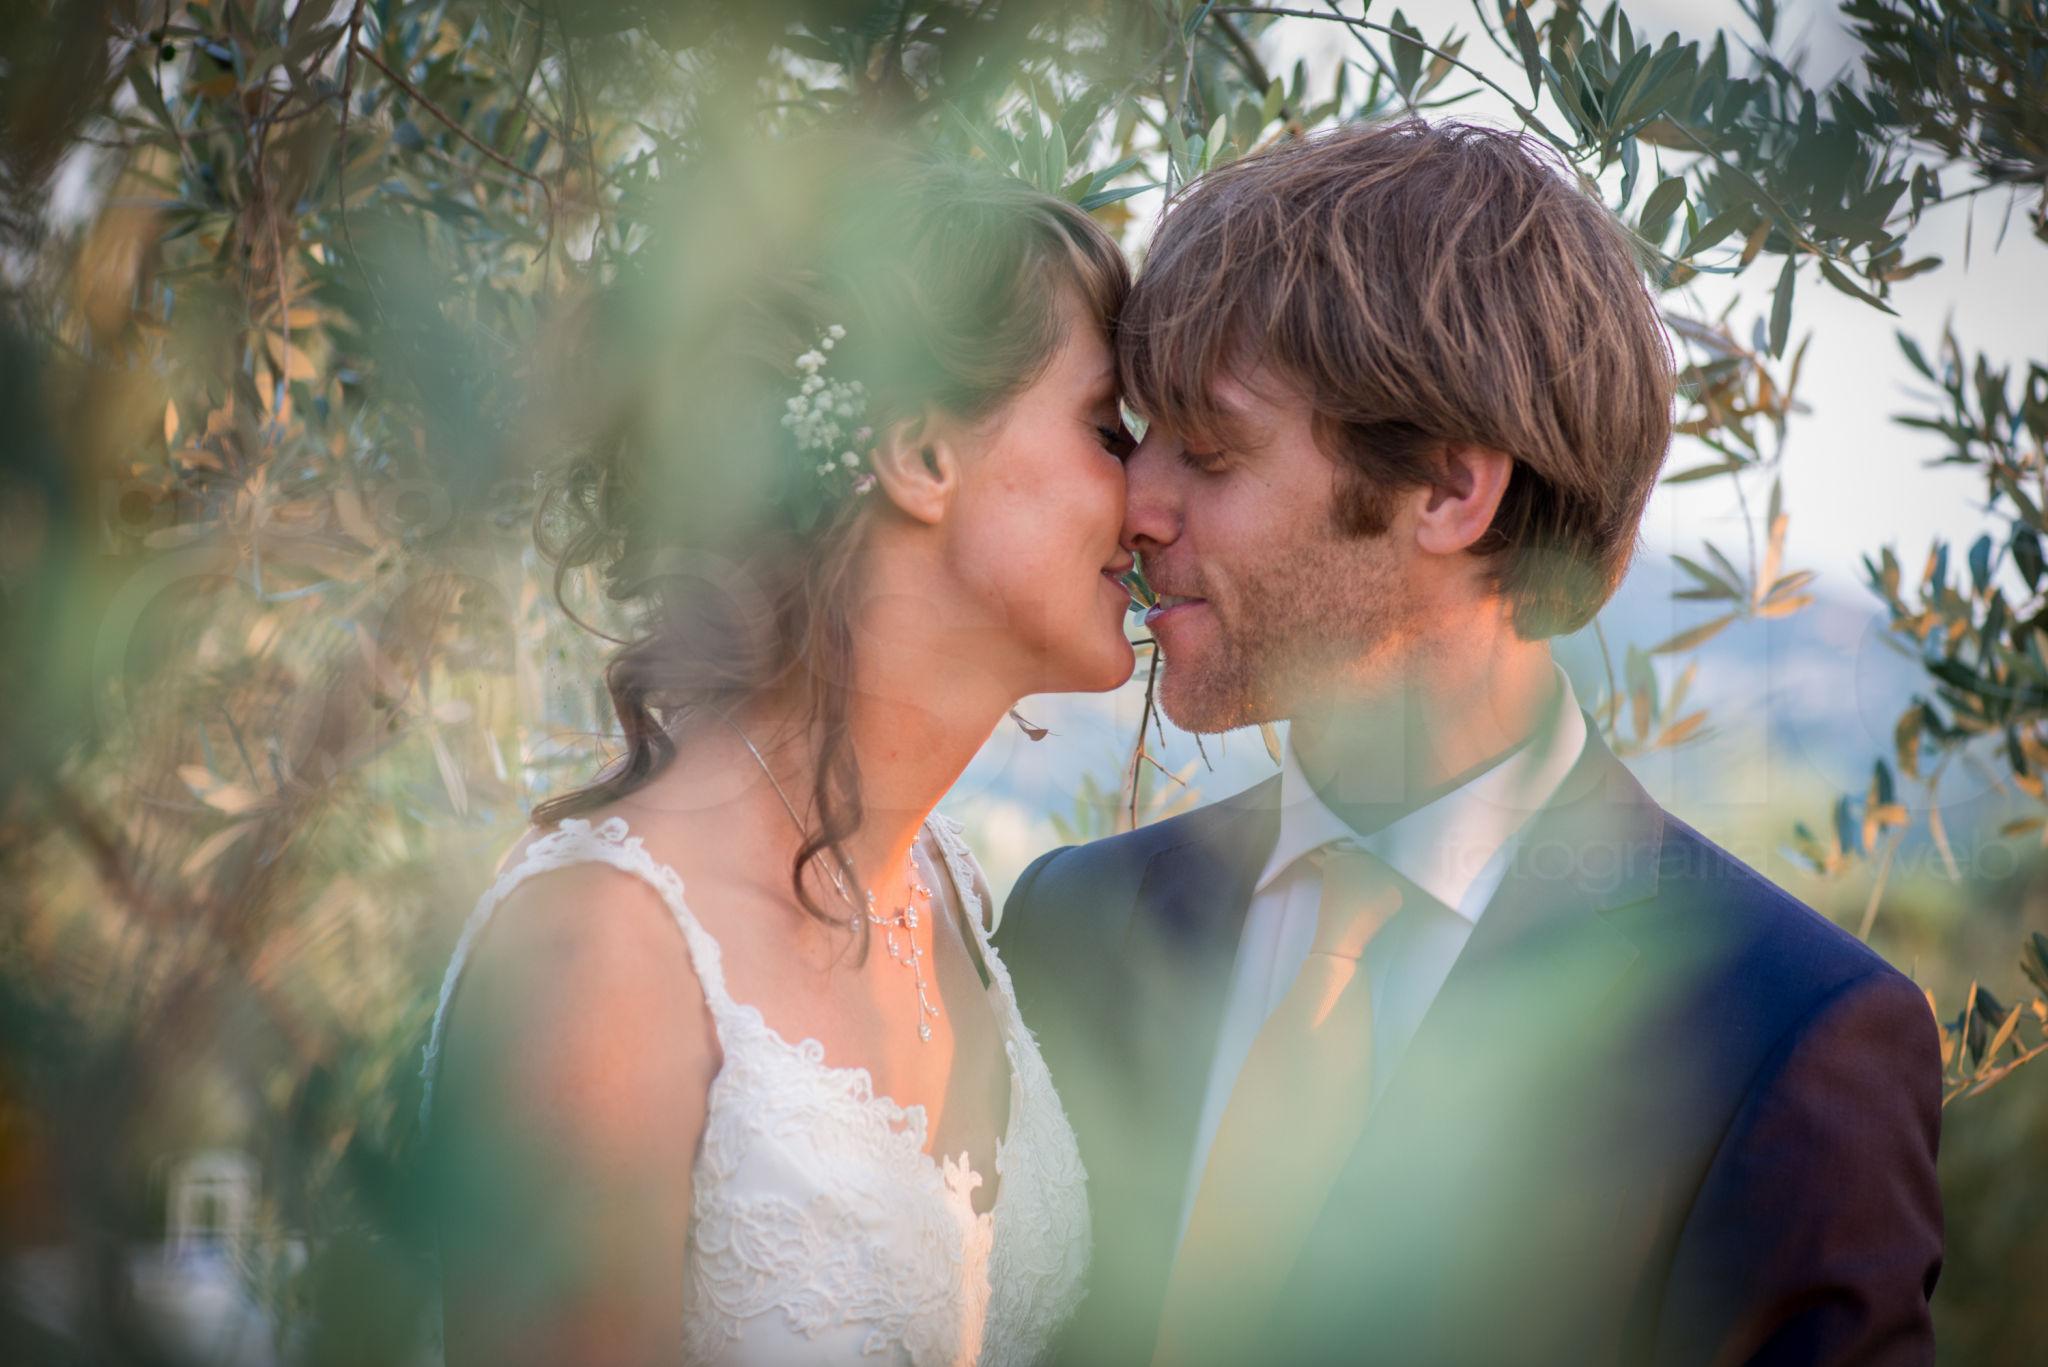 http://lnx.mirkone.it/wp-content/uploads/2015/07/fotografo-matrimoni-faenza-0026.jpg